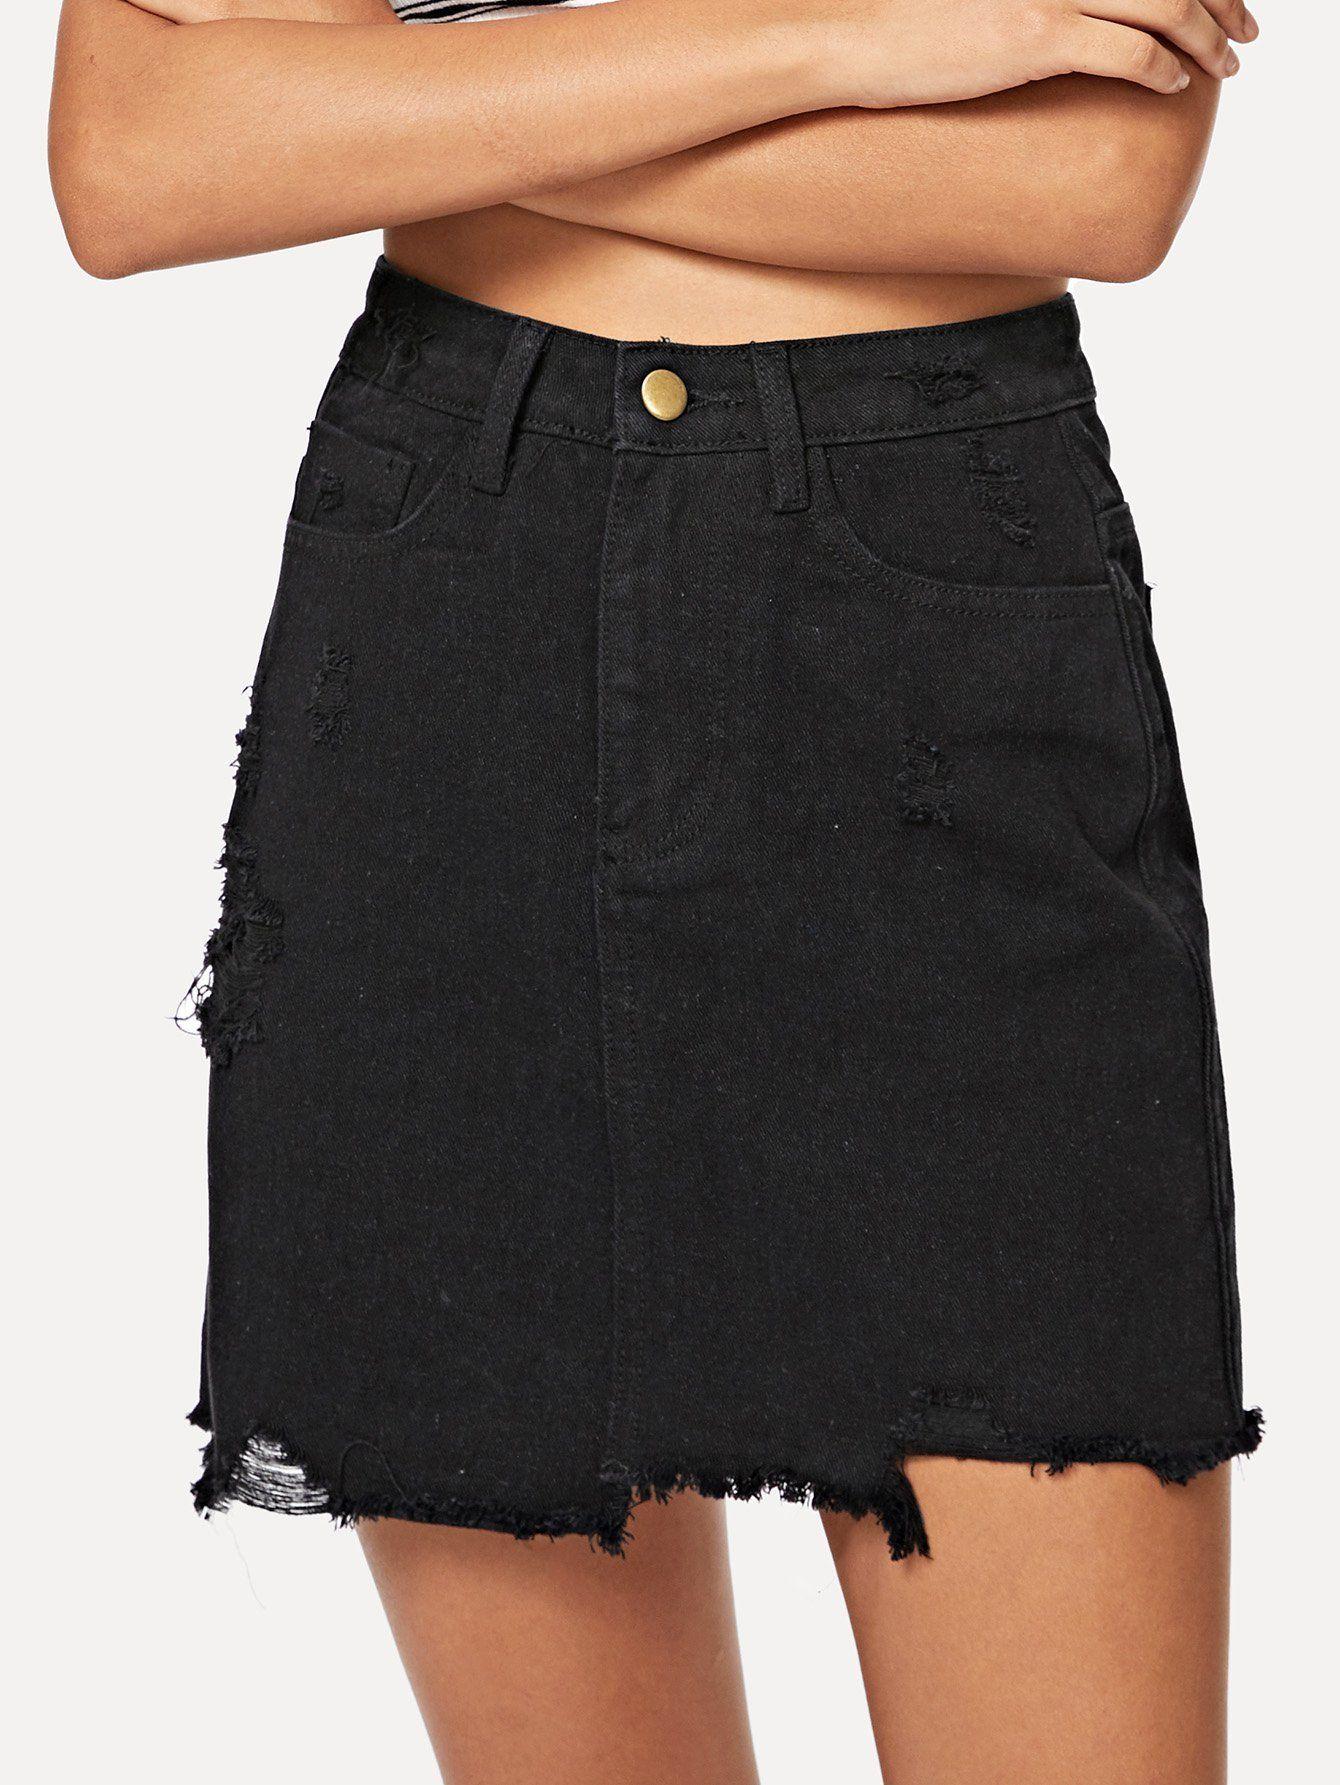 97d31ed0d6 Pocket Patched Raw Hem Black Denim Skirt FREE SHIP